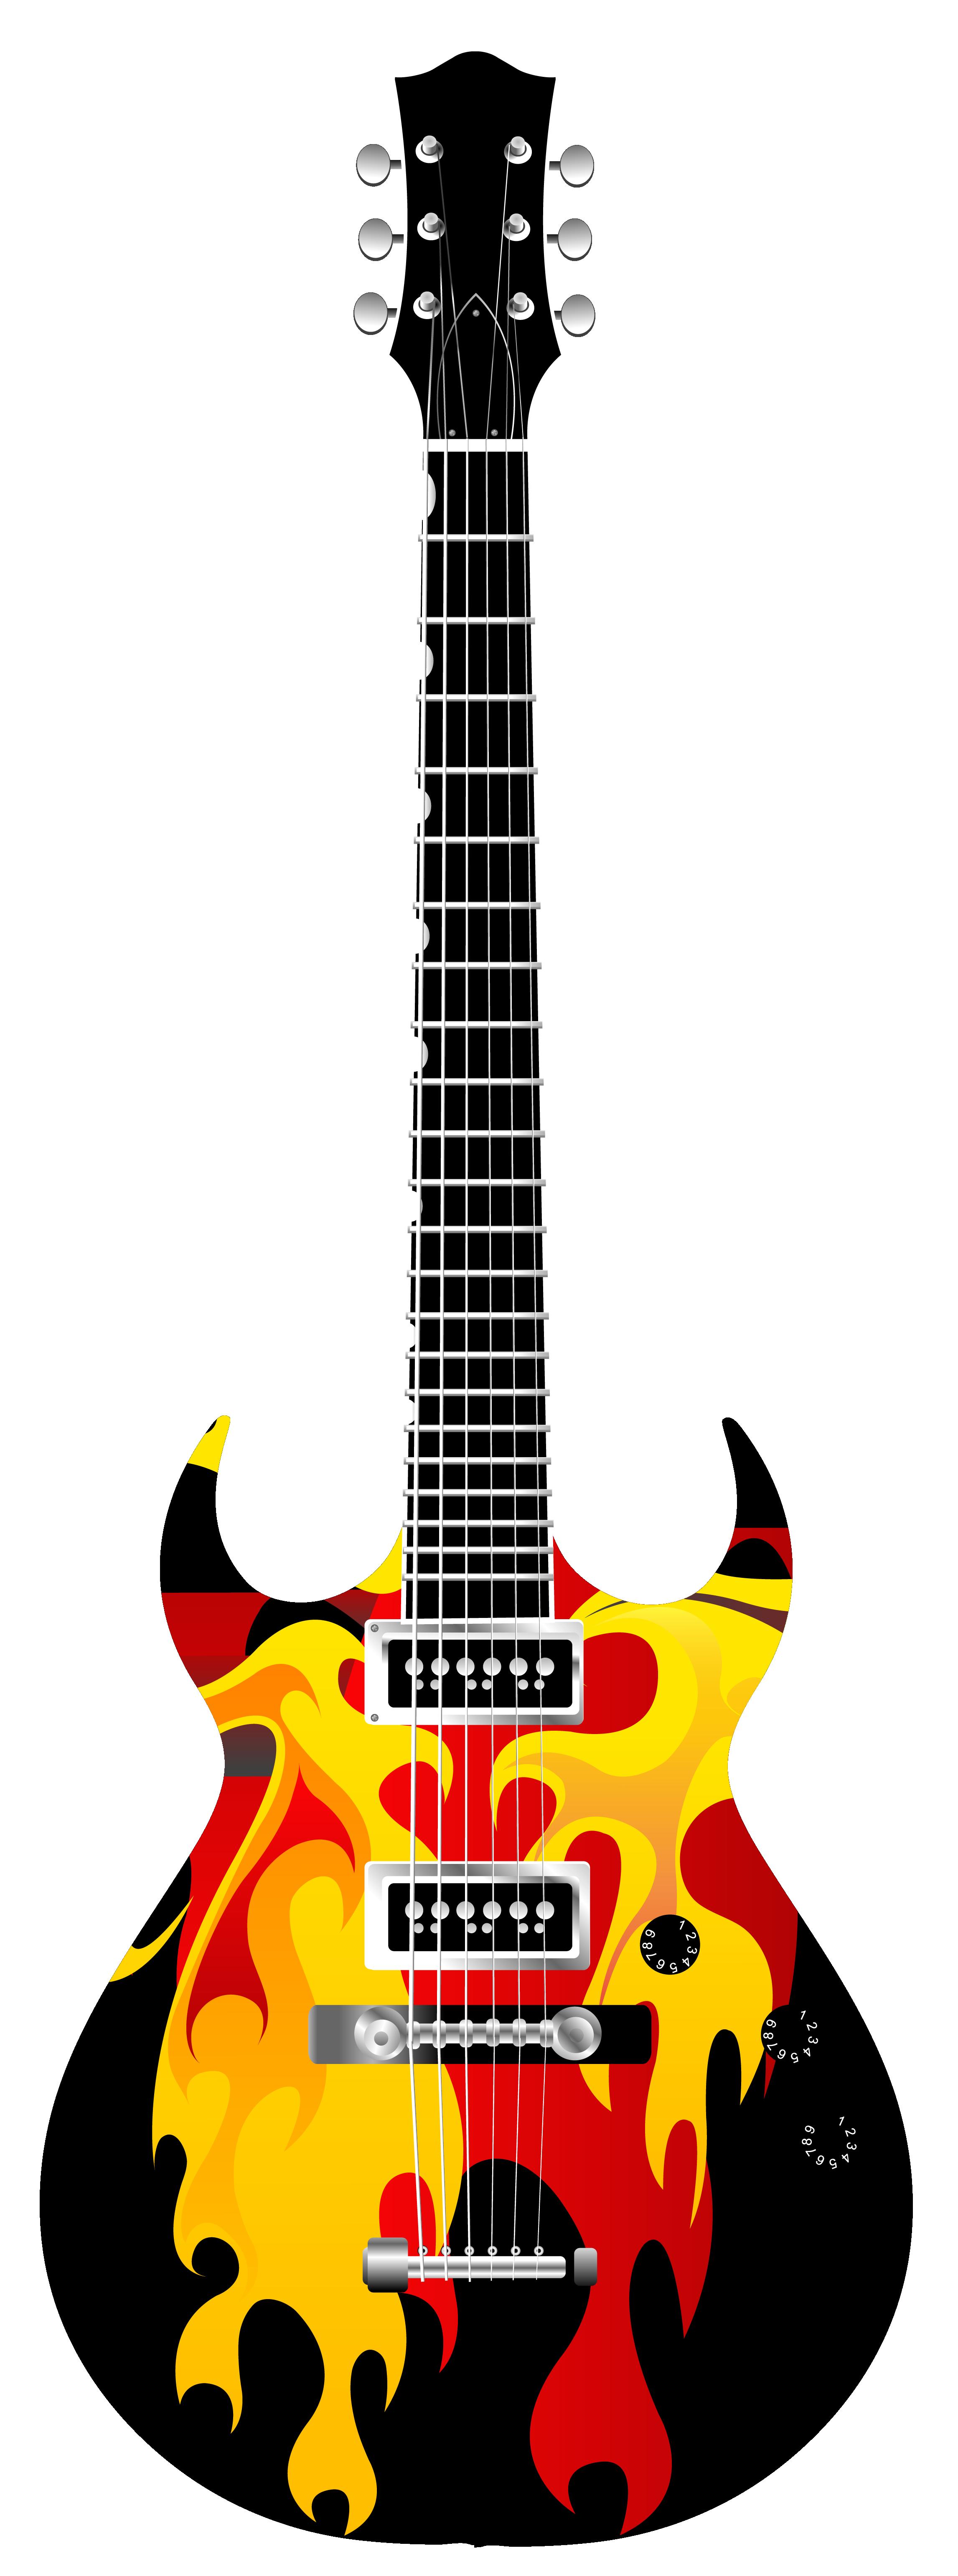 2293x6168 Guitar Mouth Clipart